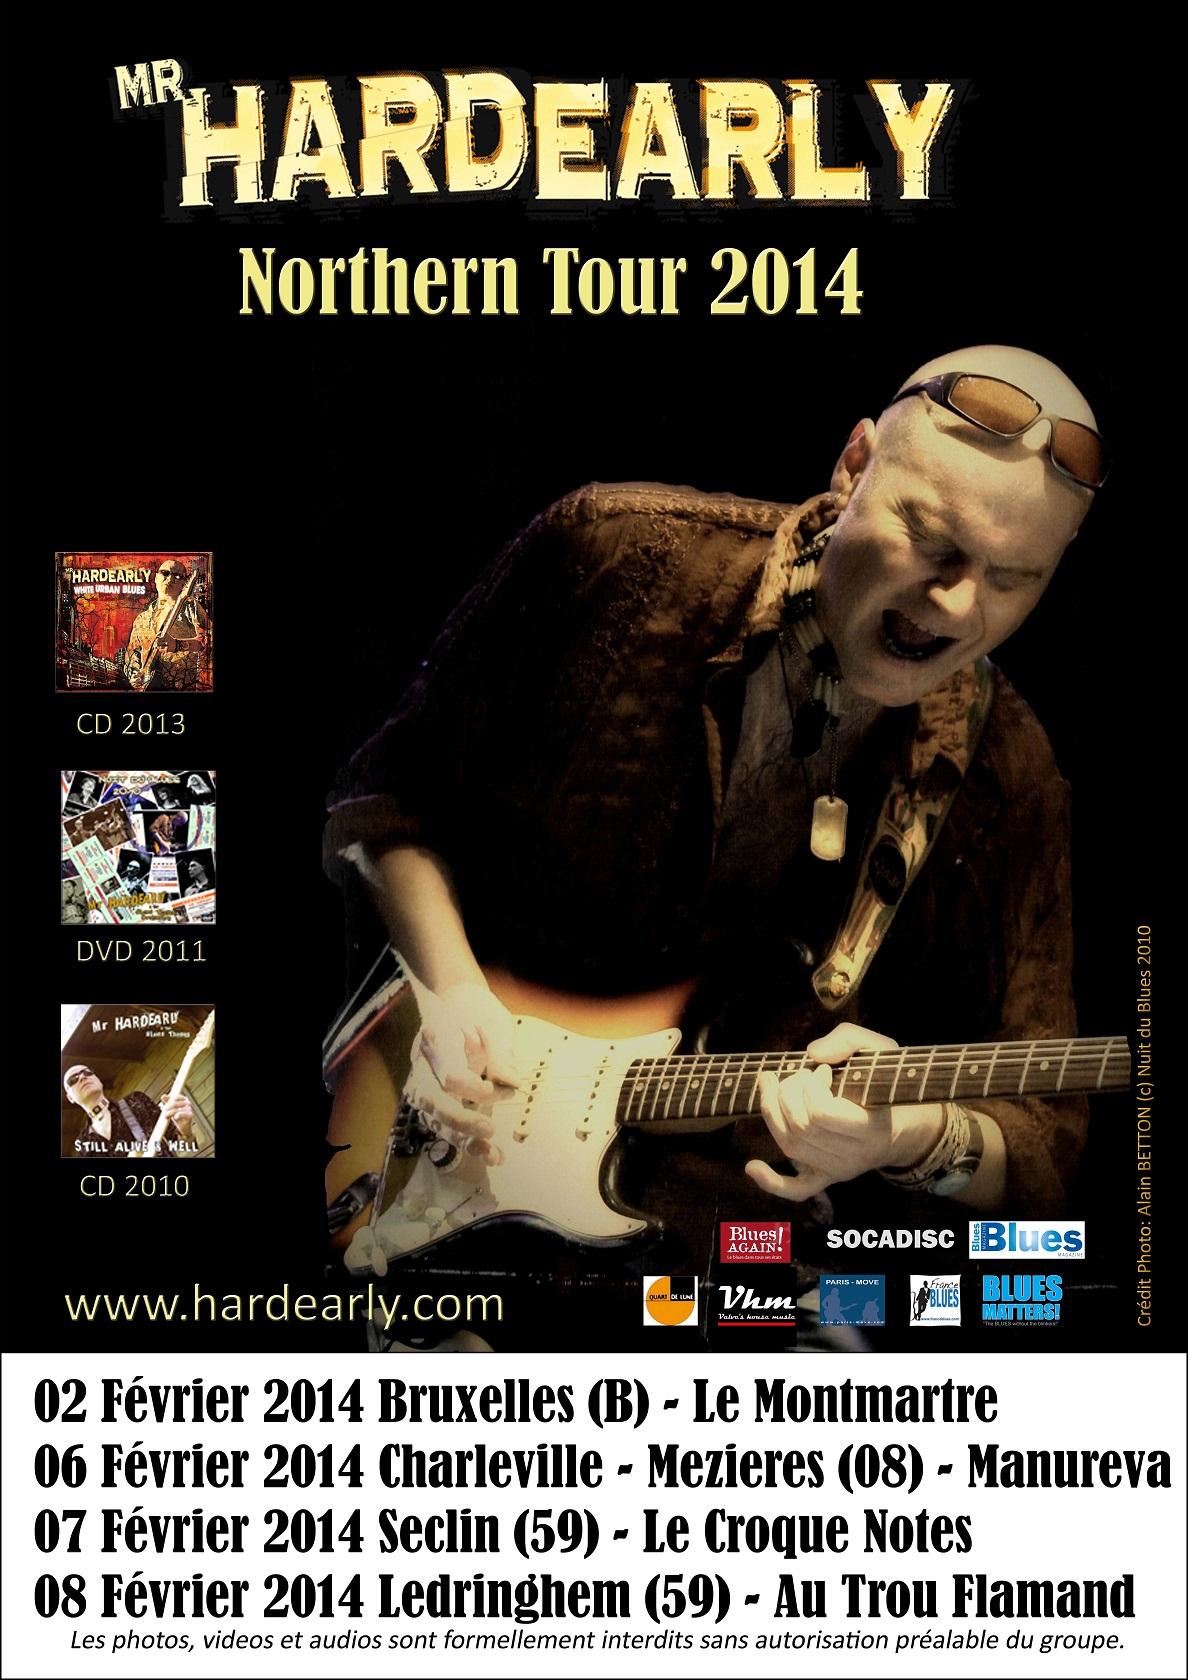 Northern Tour 2014